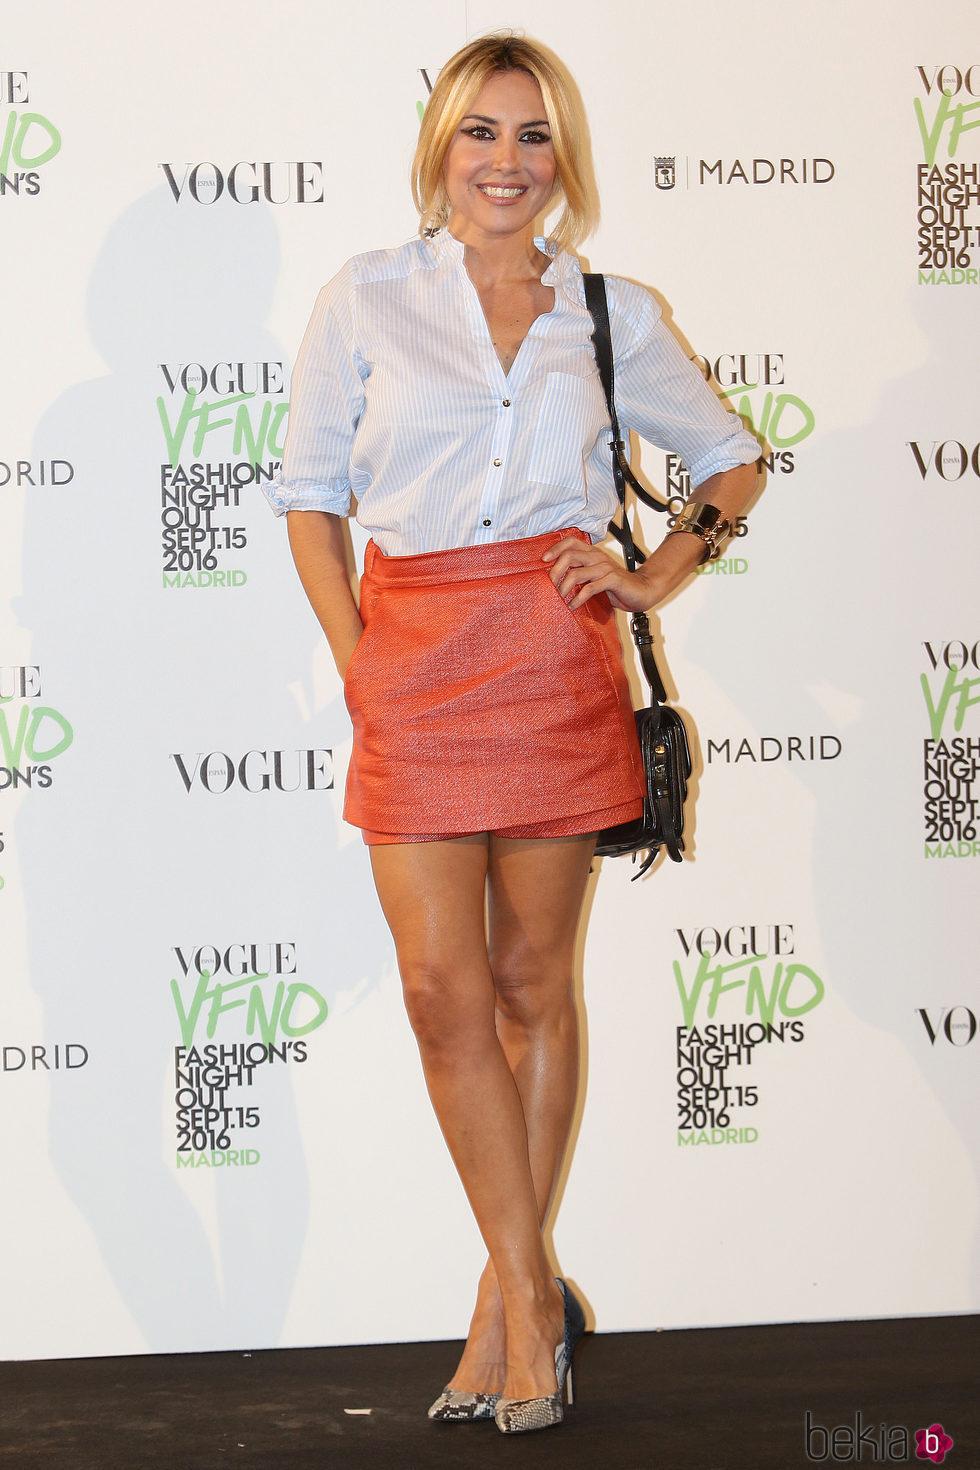 Vogue Kiss Fashion Com